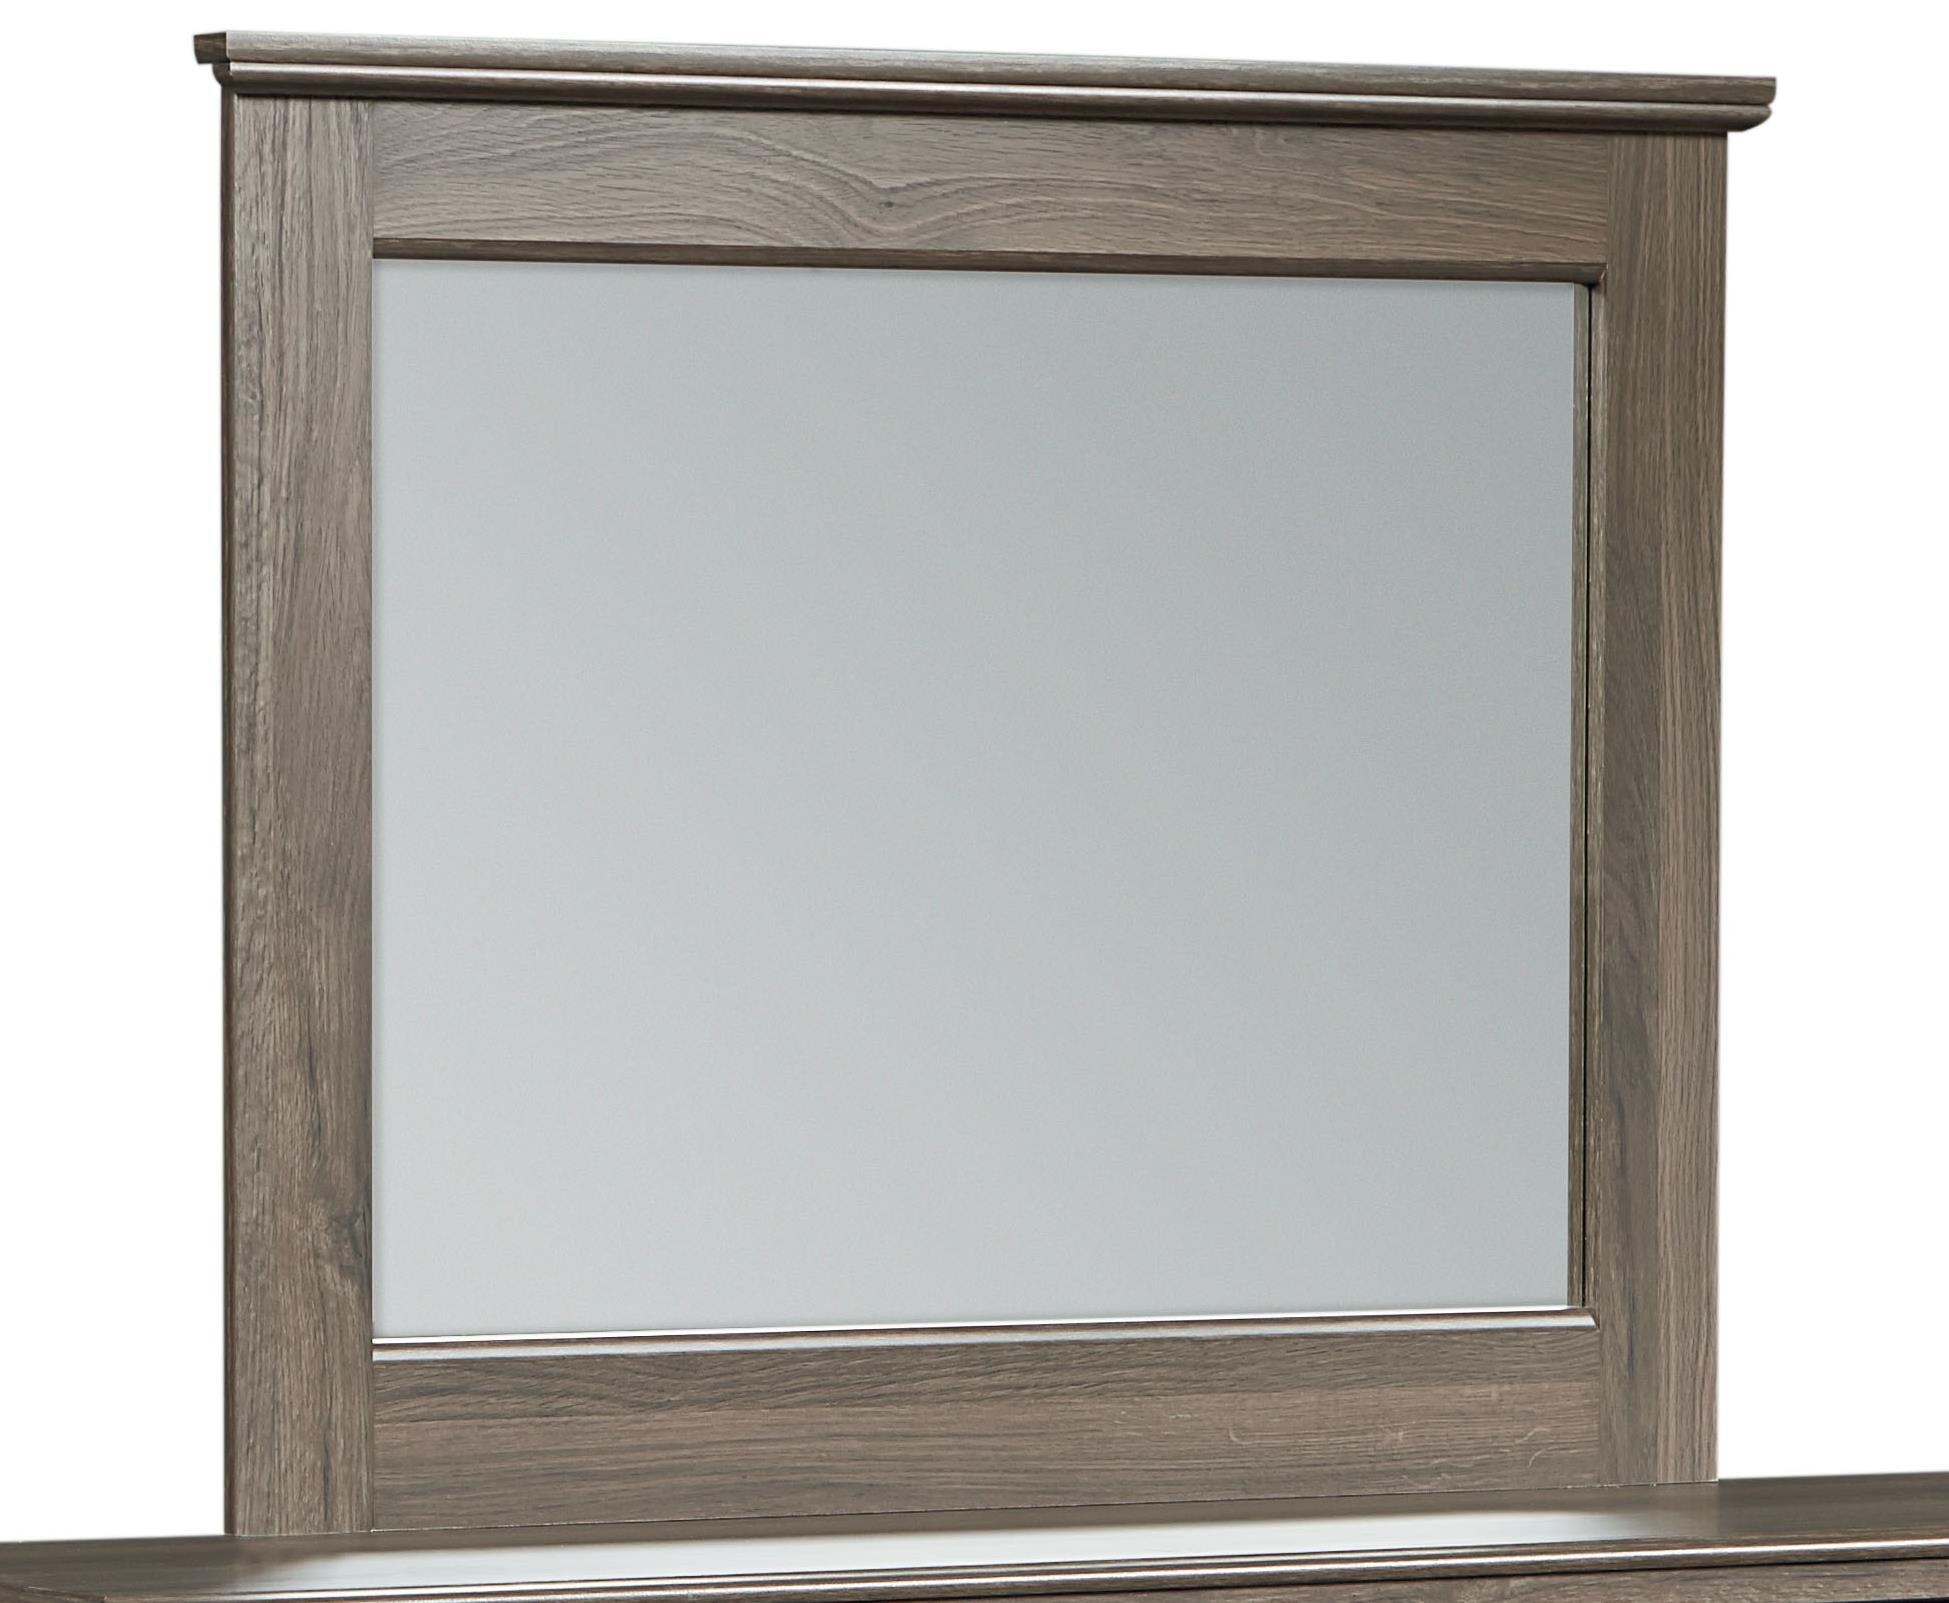 Standard Furniture Hayward Mirror         - Item Number: 56518